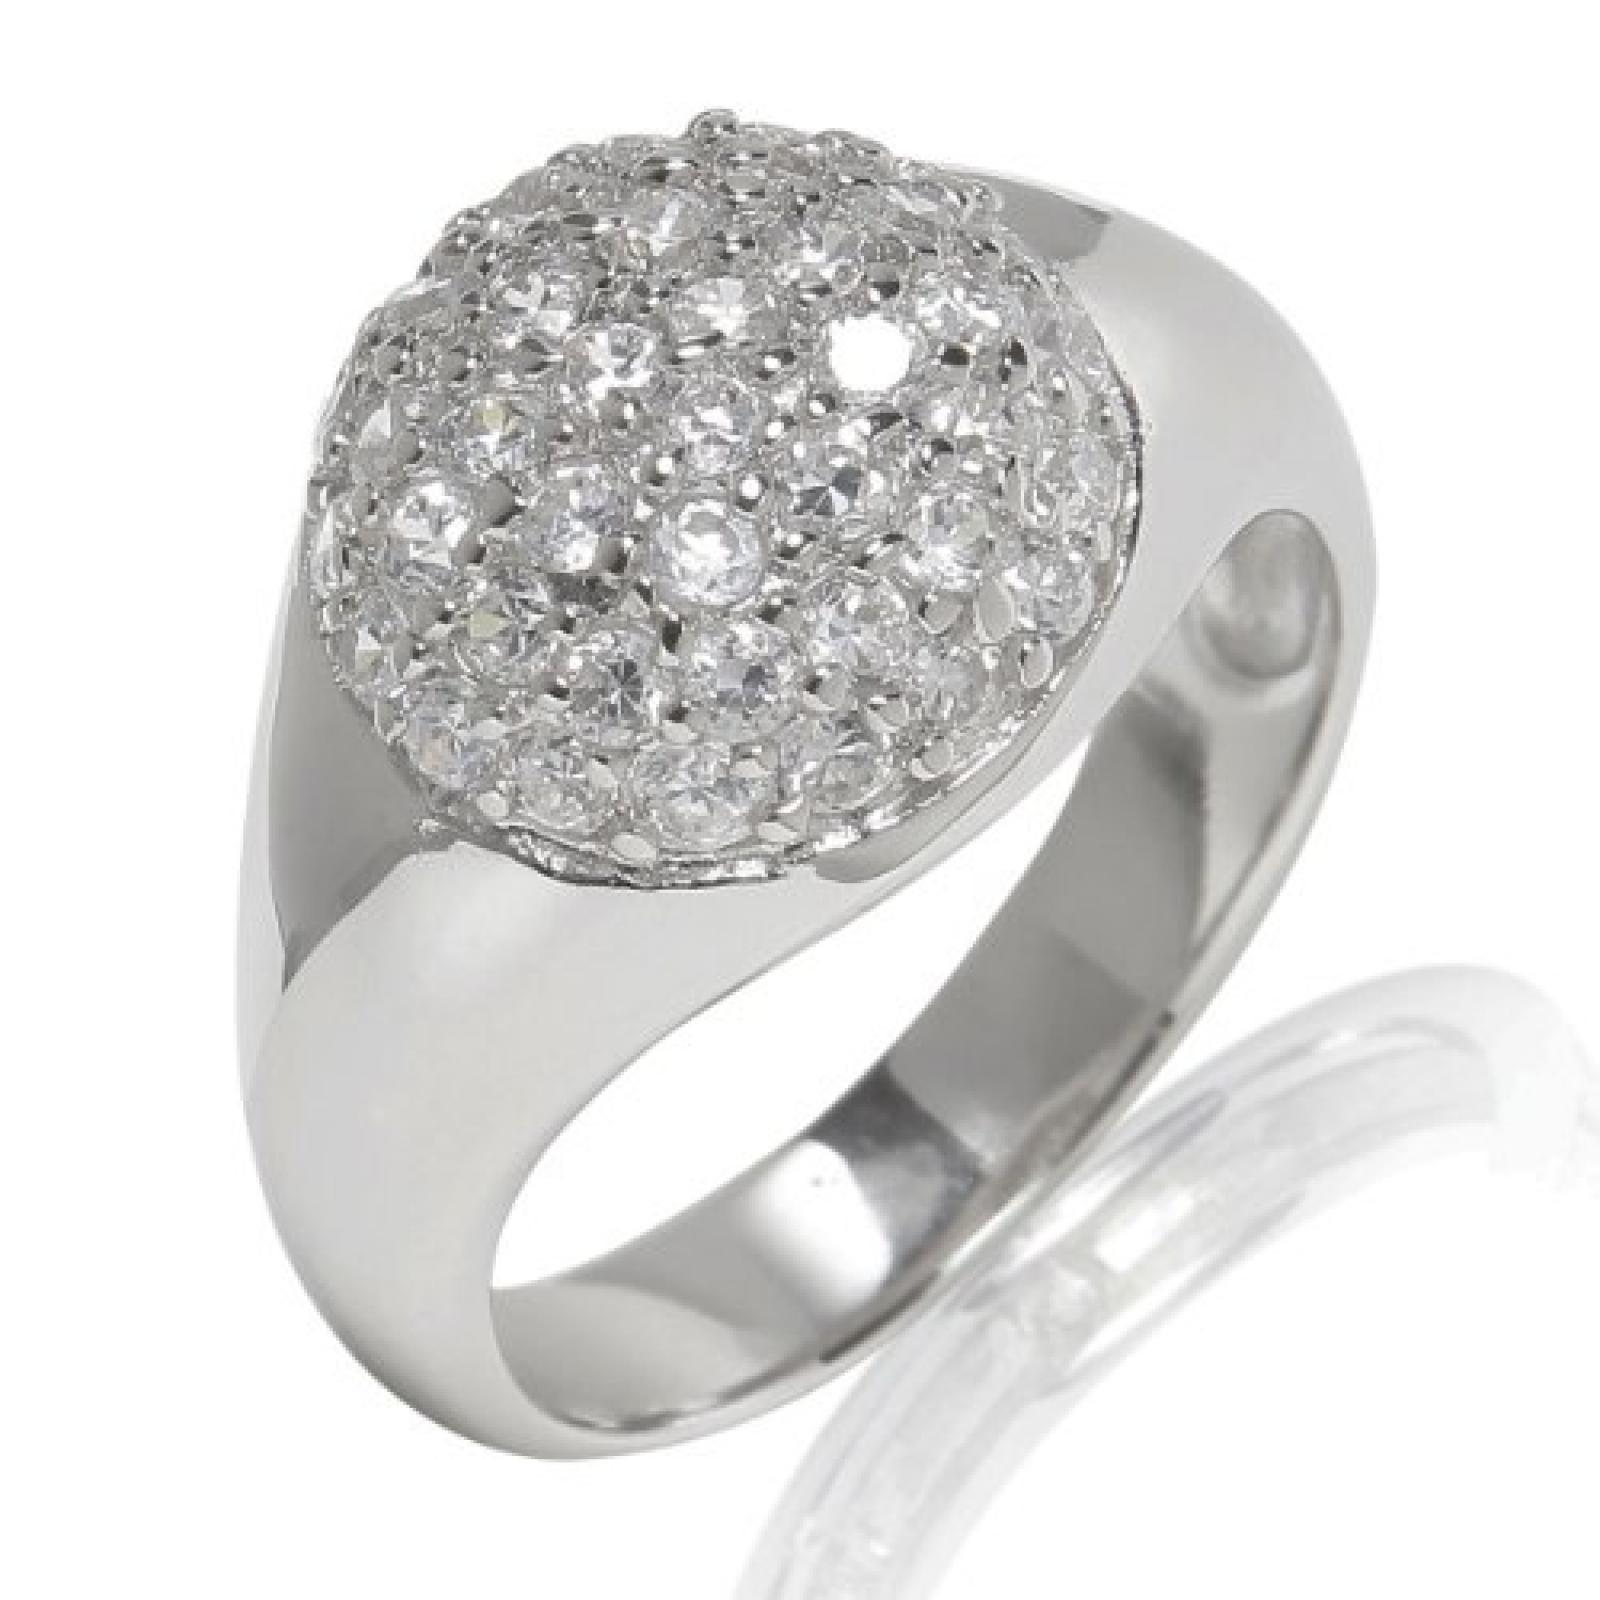 Rafaela Donata Ring Sterling Silber Zirkonia weiß